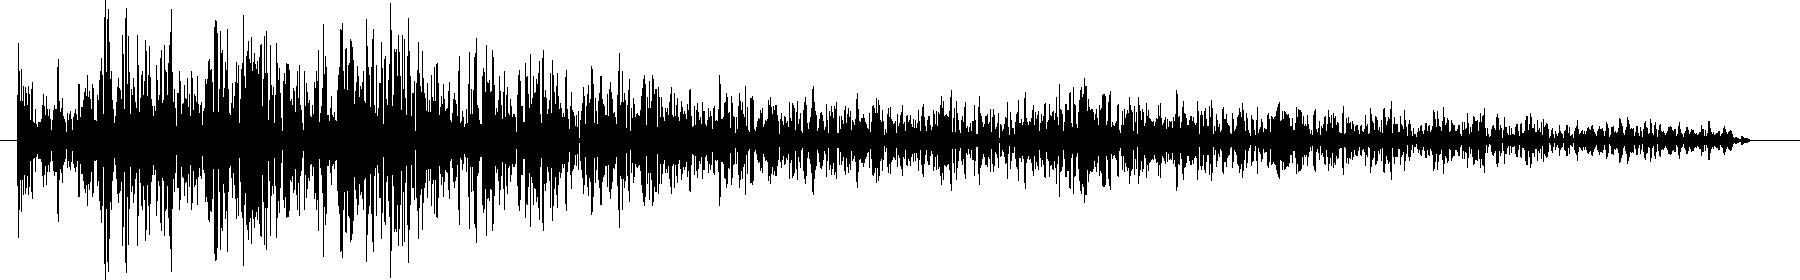 perc 1 34